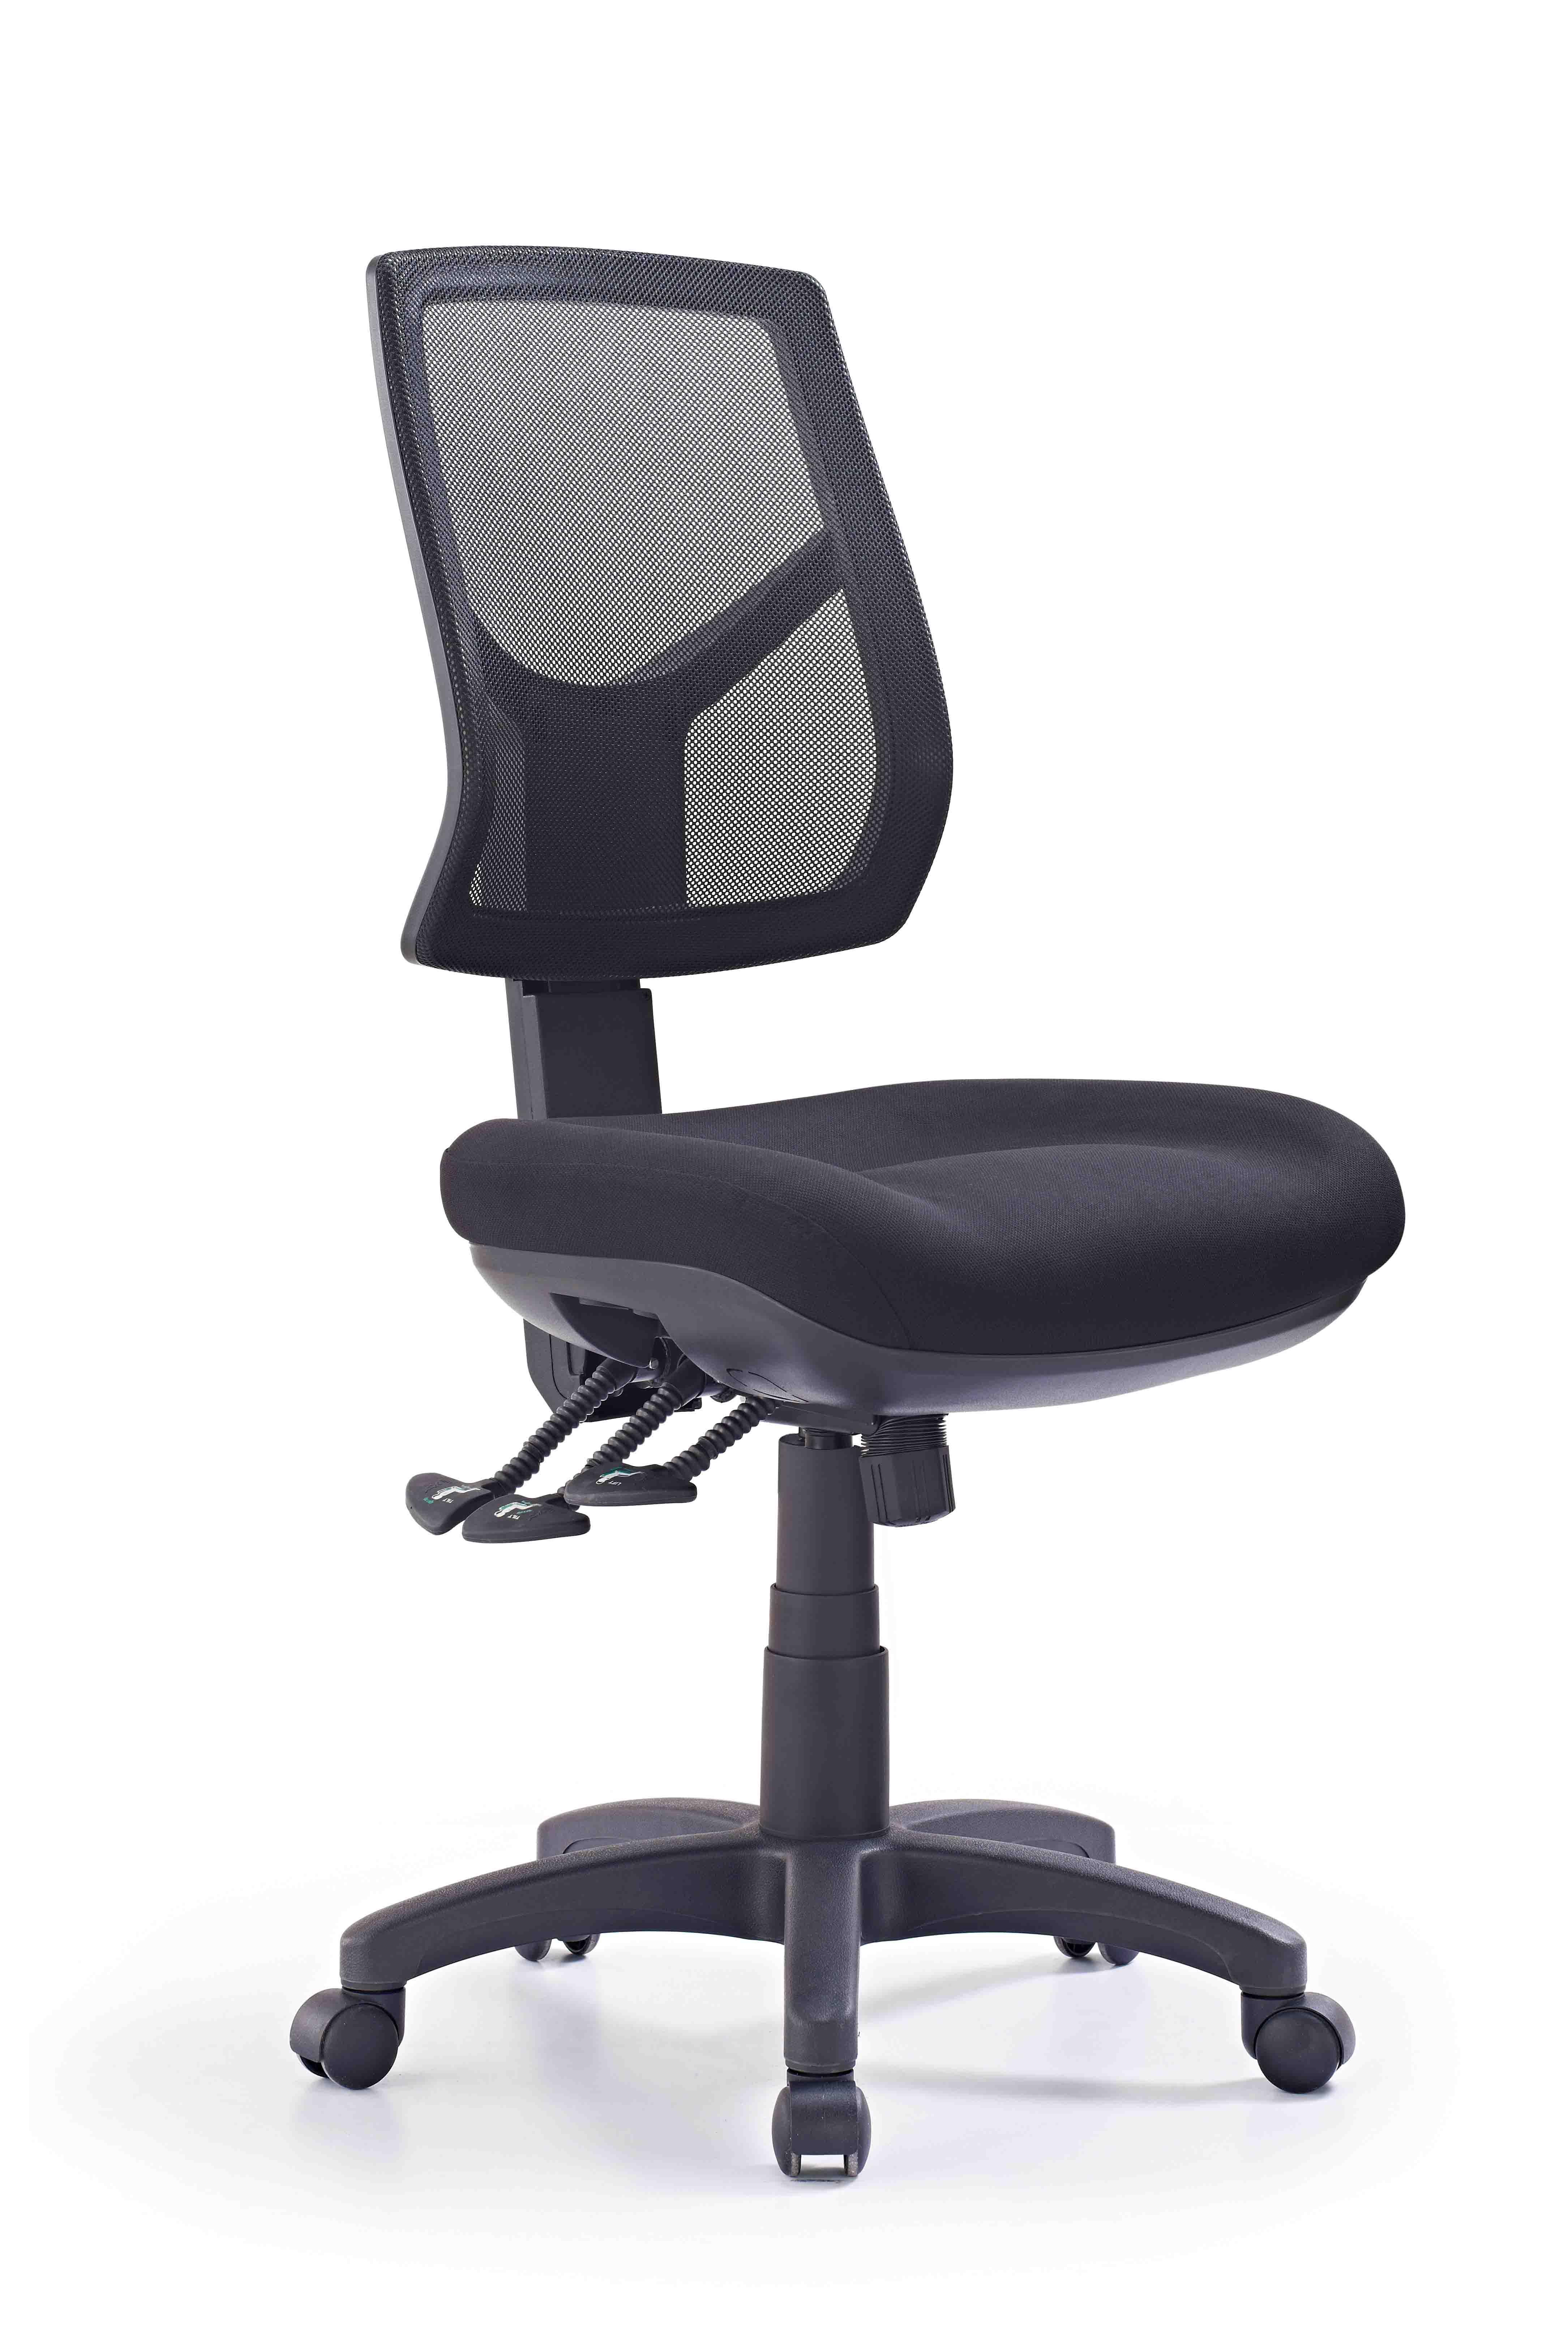 Amazing Office Chair  Office Chairs  Gumtree Australia Geelong Region